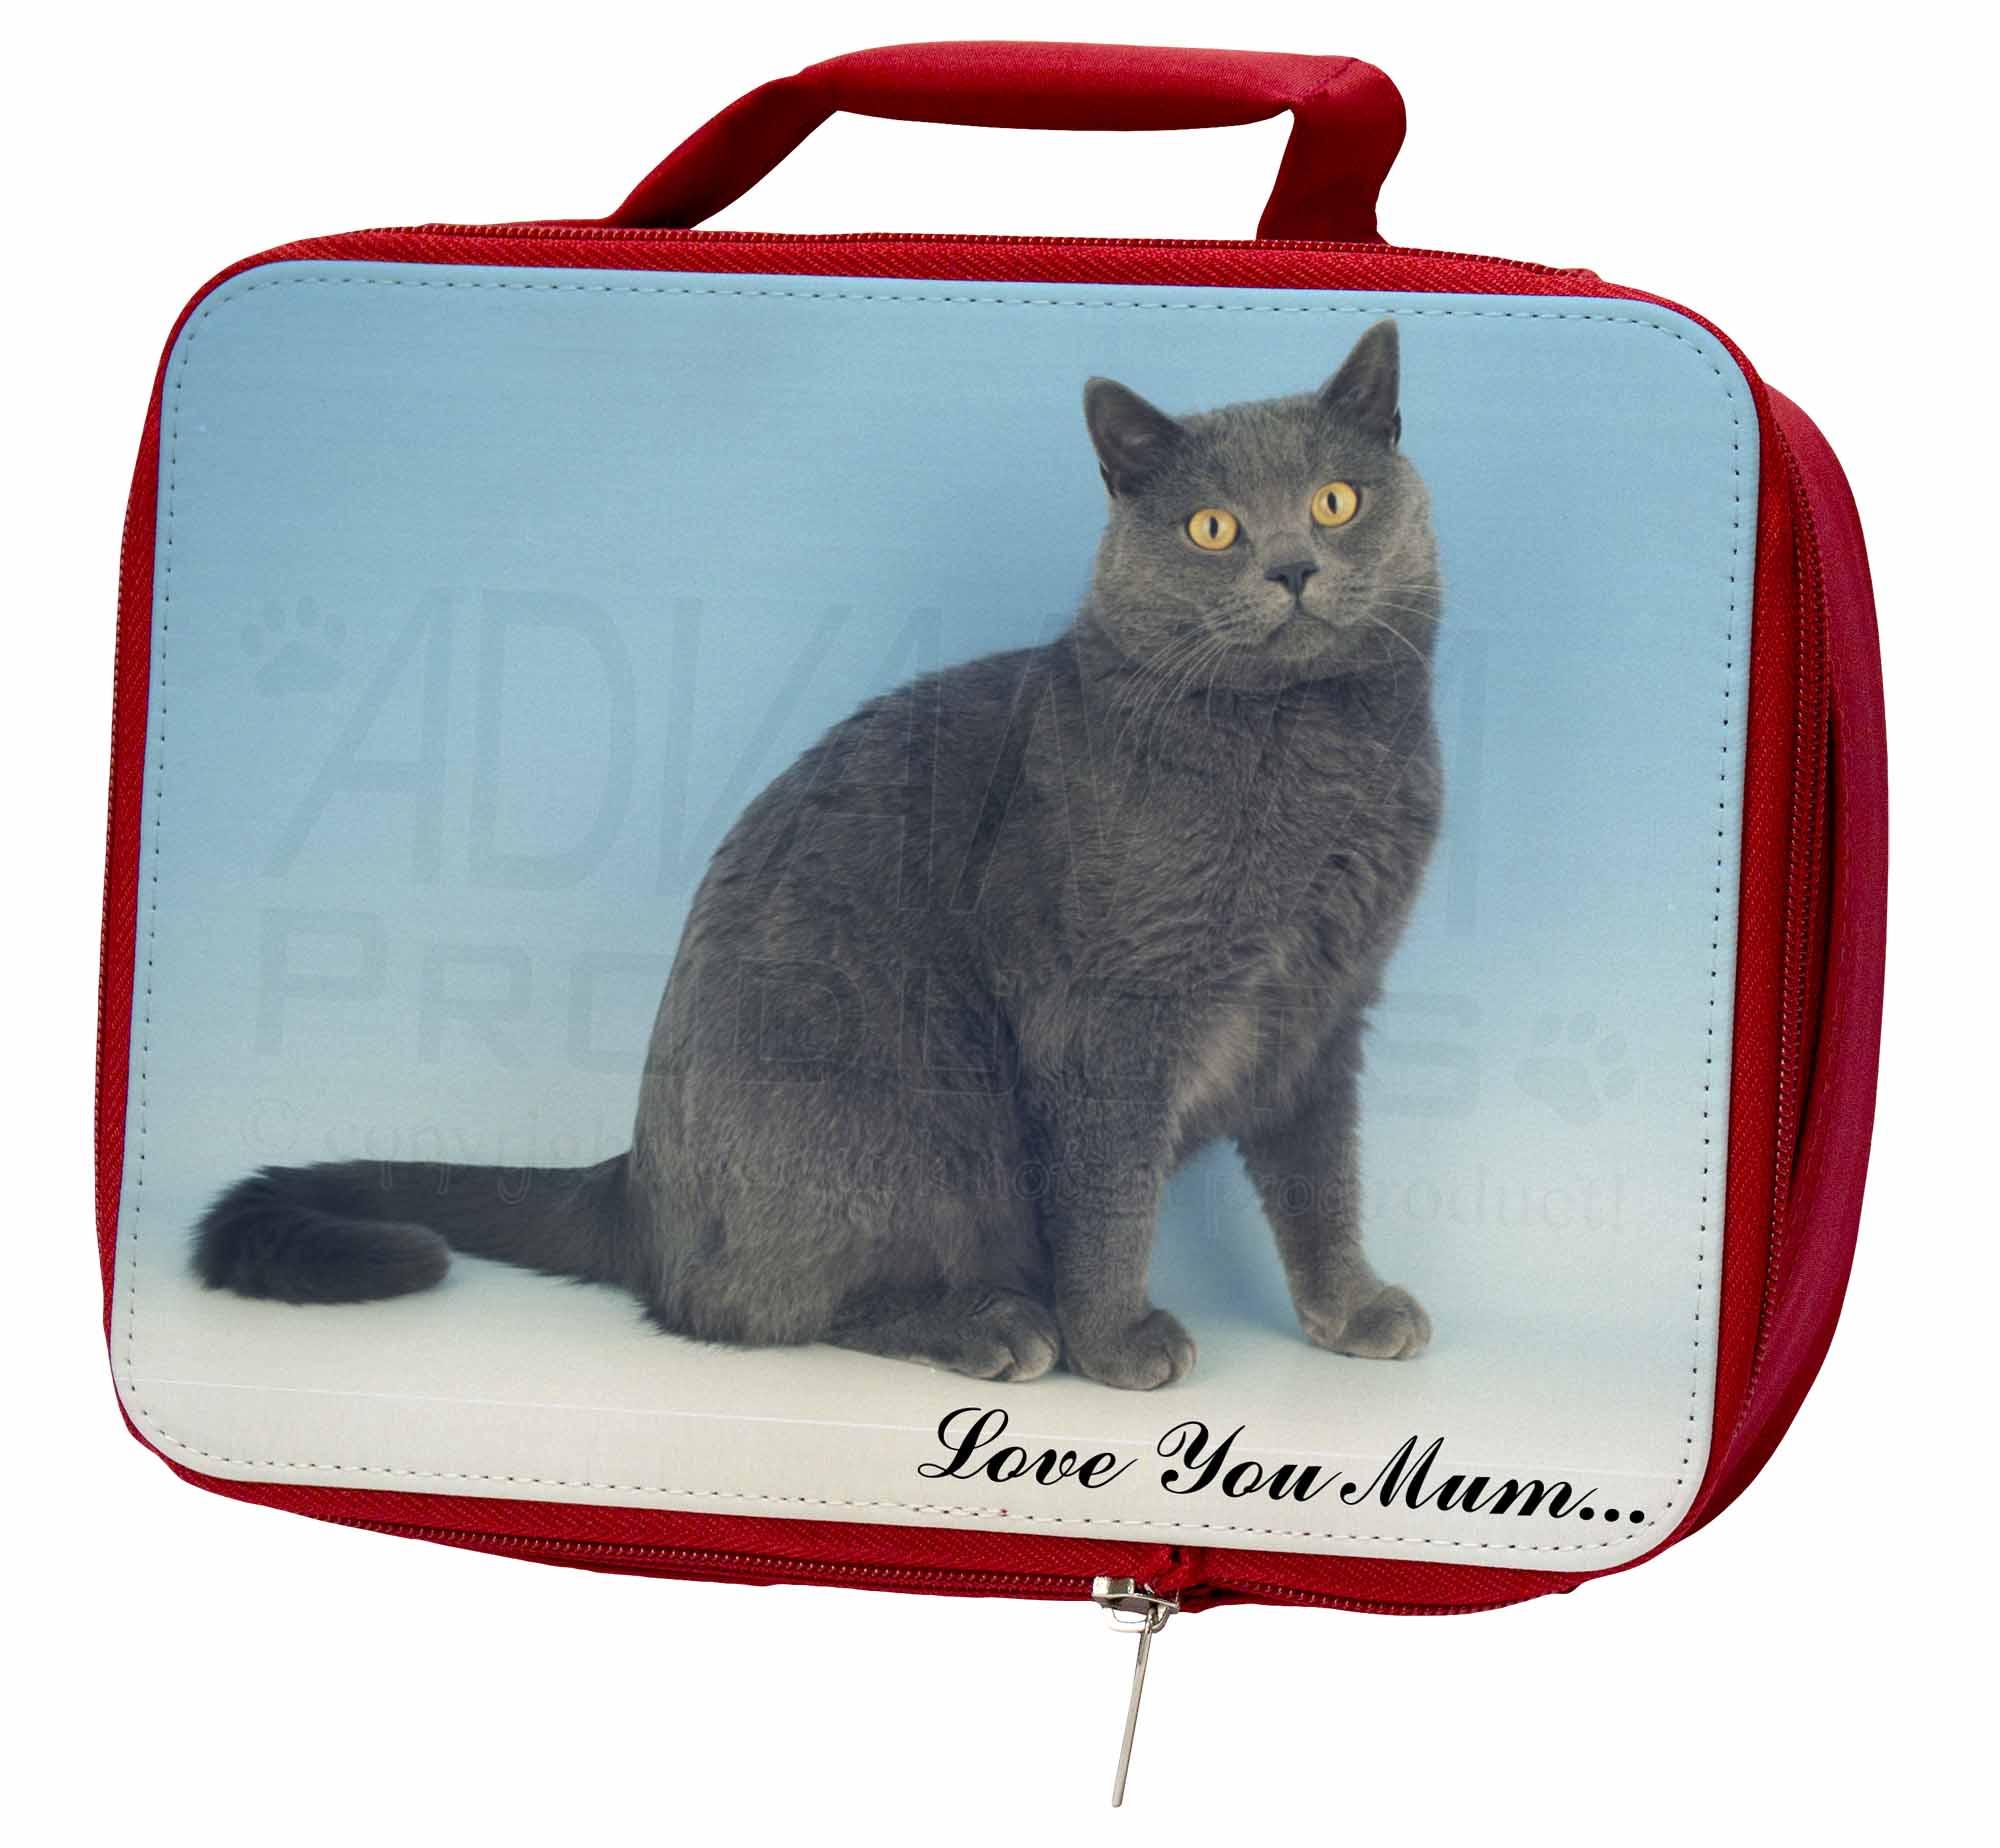 Chartreax Cat 'Love Insulated You Mum' Insulated 'Love Red School Lunch Box/Picnic , AC-34lymLBR fa50ad